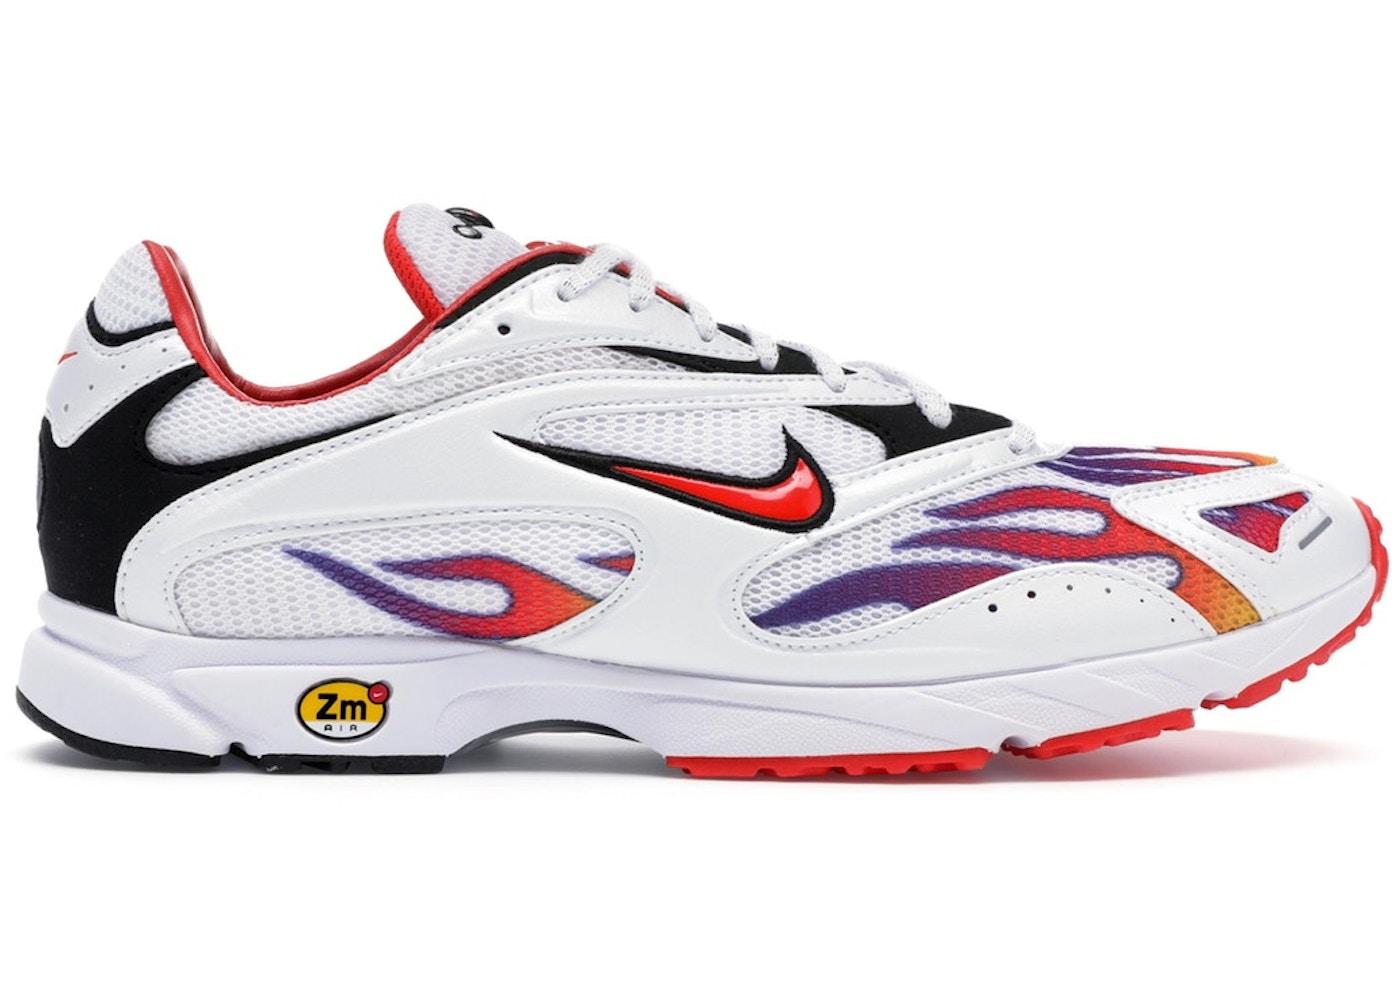 new product 78404 cfecc Nike Zoom Streak Spectrum Plus Supreme White